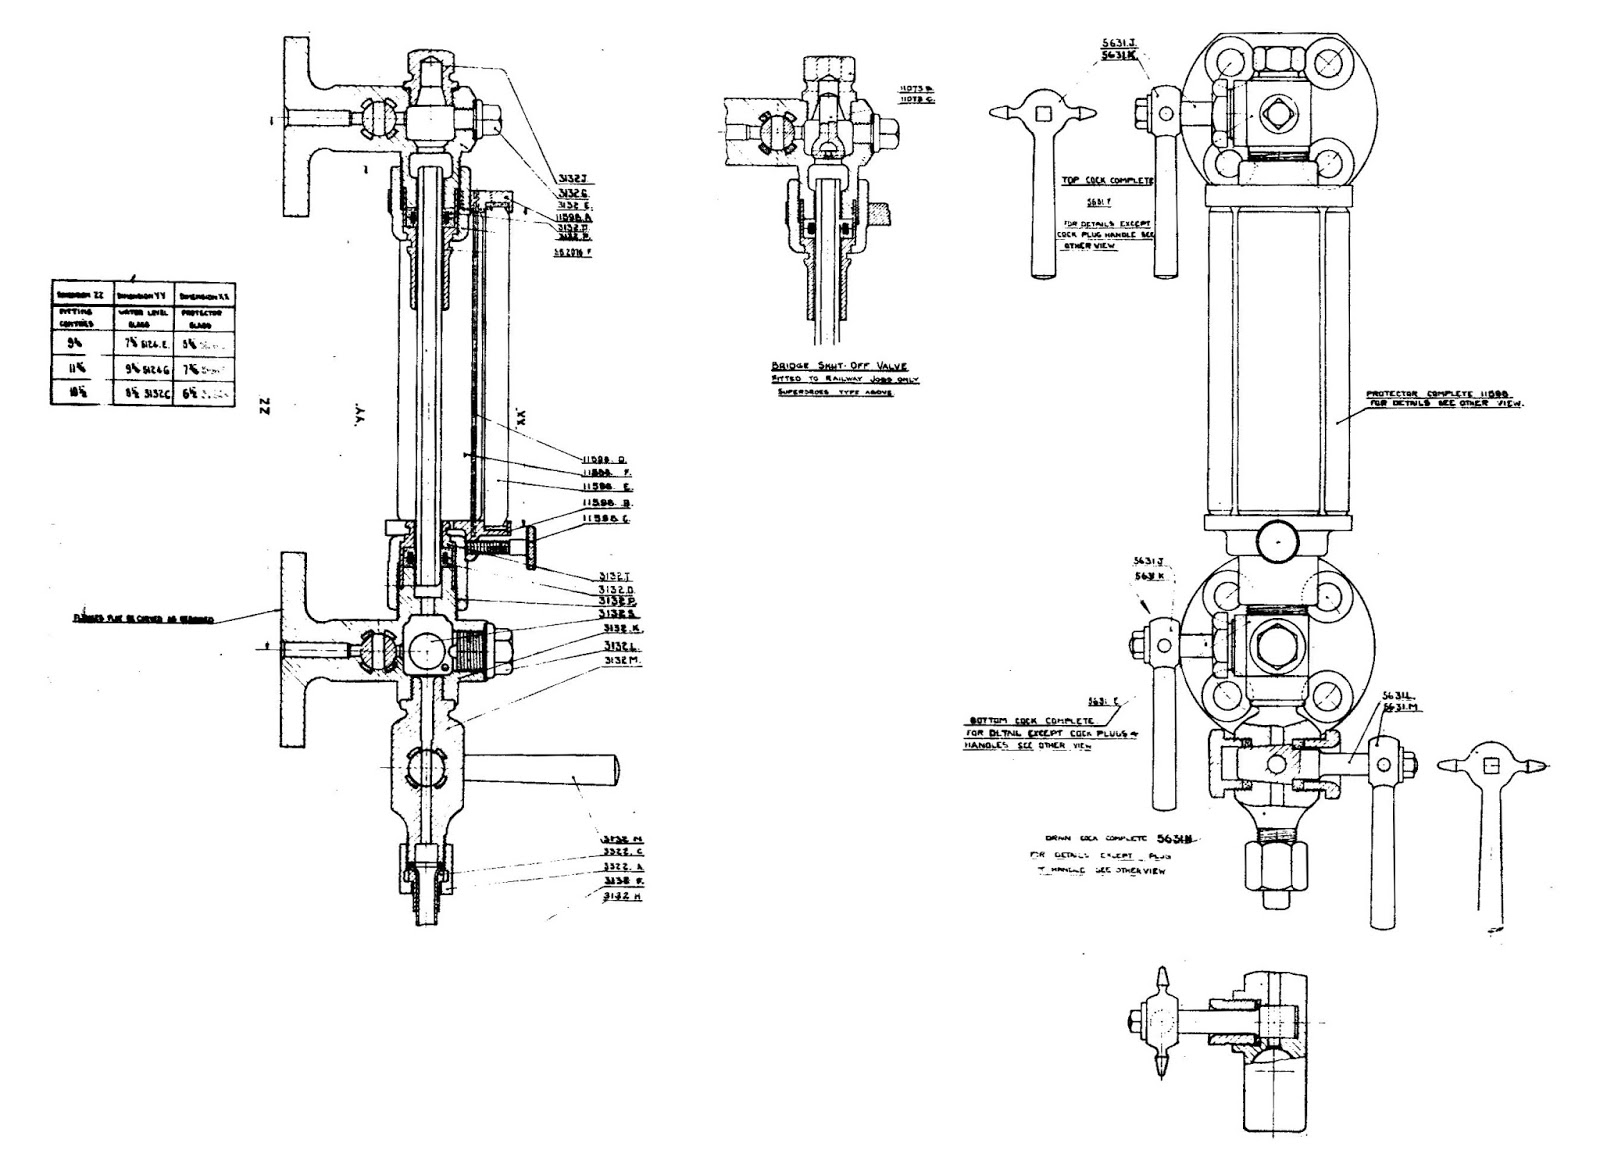 hight resolution of gauge glass valve arrangement similar to 7109 s